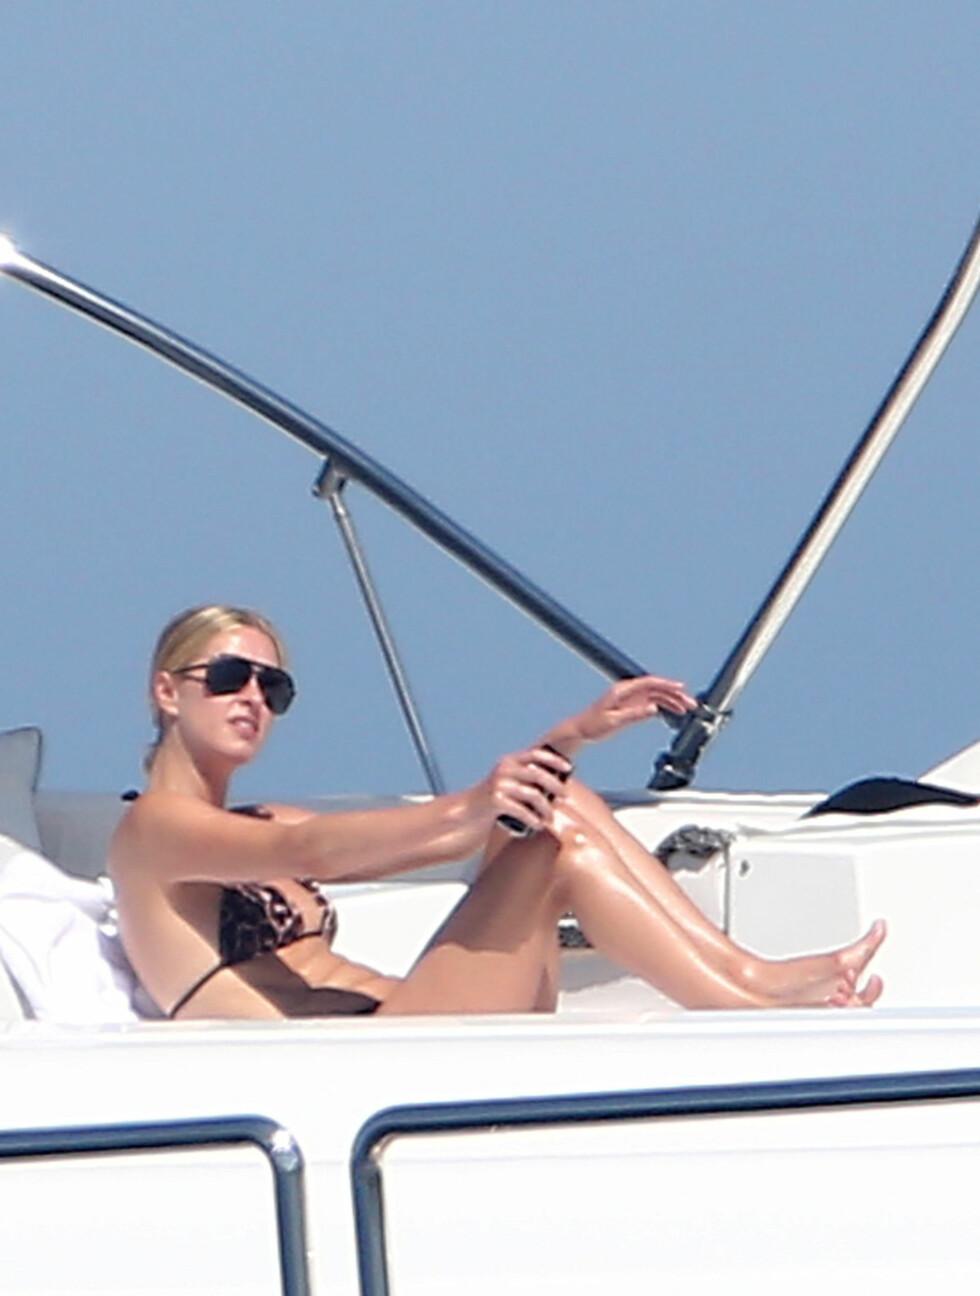 VISTE KROPPEN: Nicky Hilton. Foto: Stella Pictures